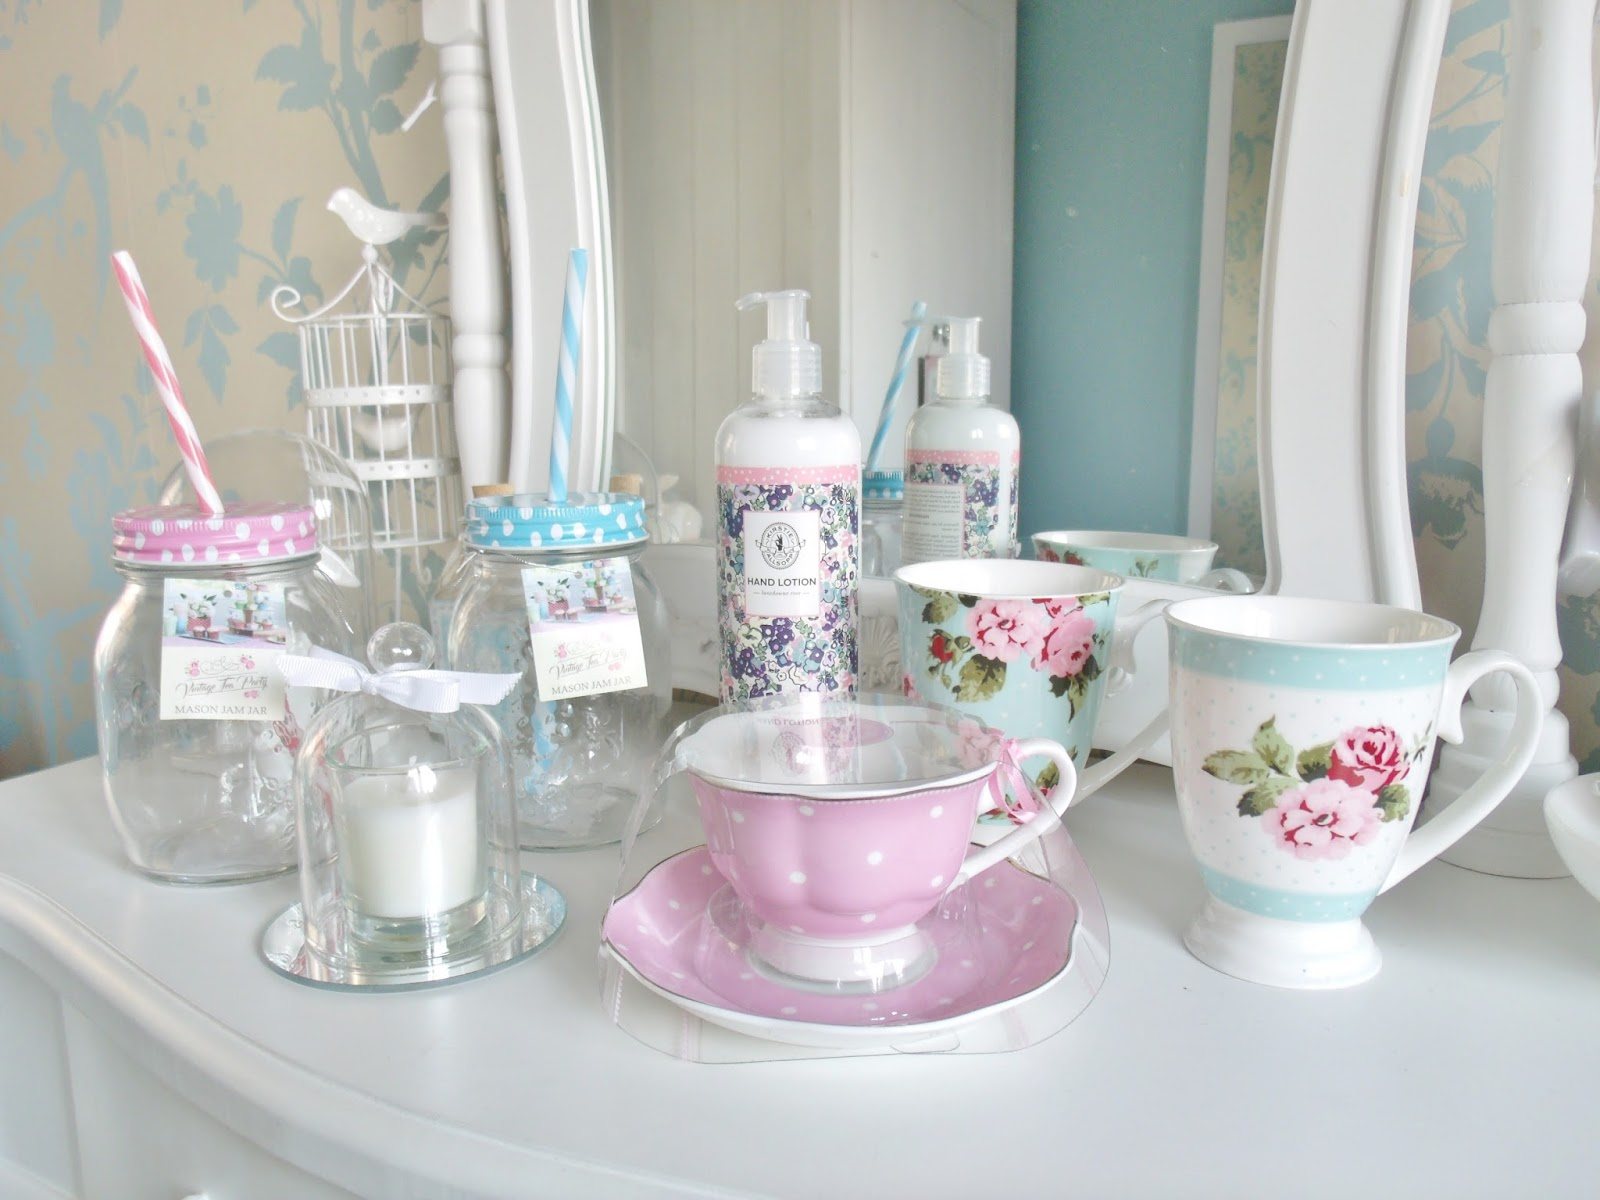 Home Bargains Homeware Haul ♥ | Victoria\'s Vintage Blog